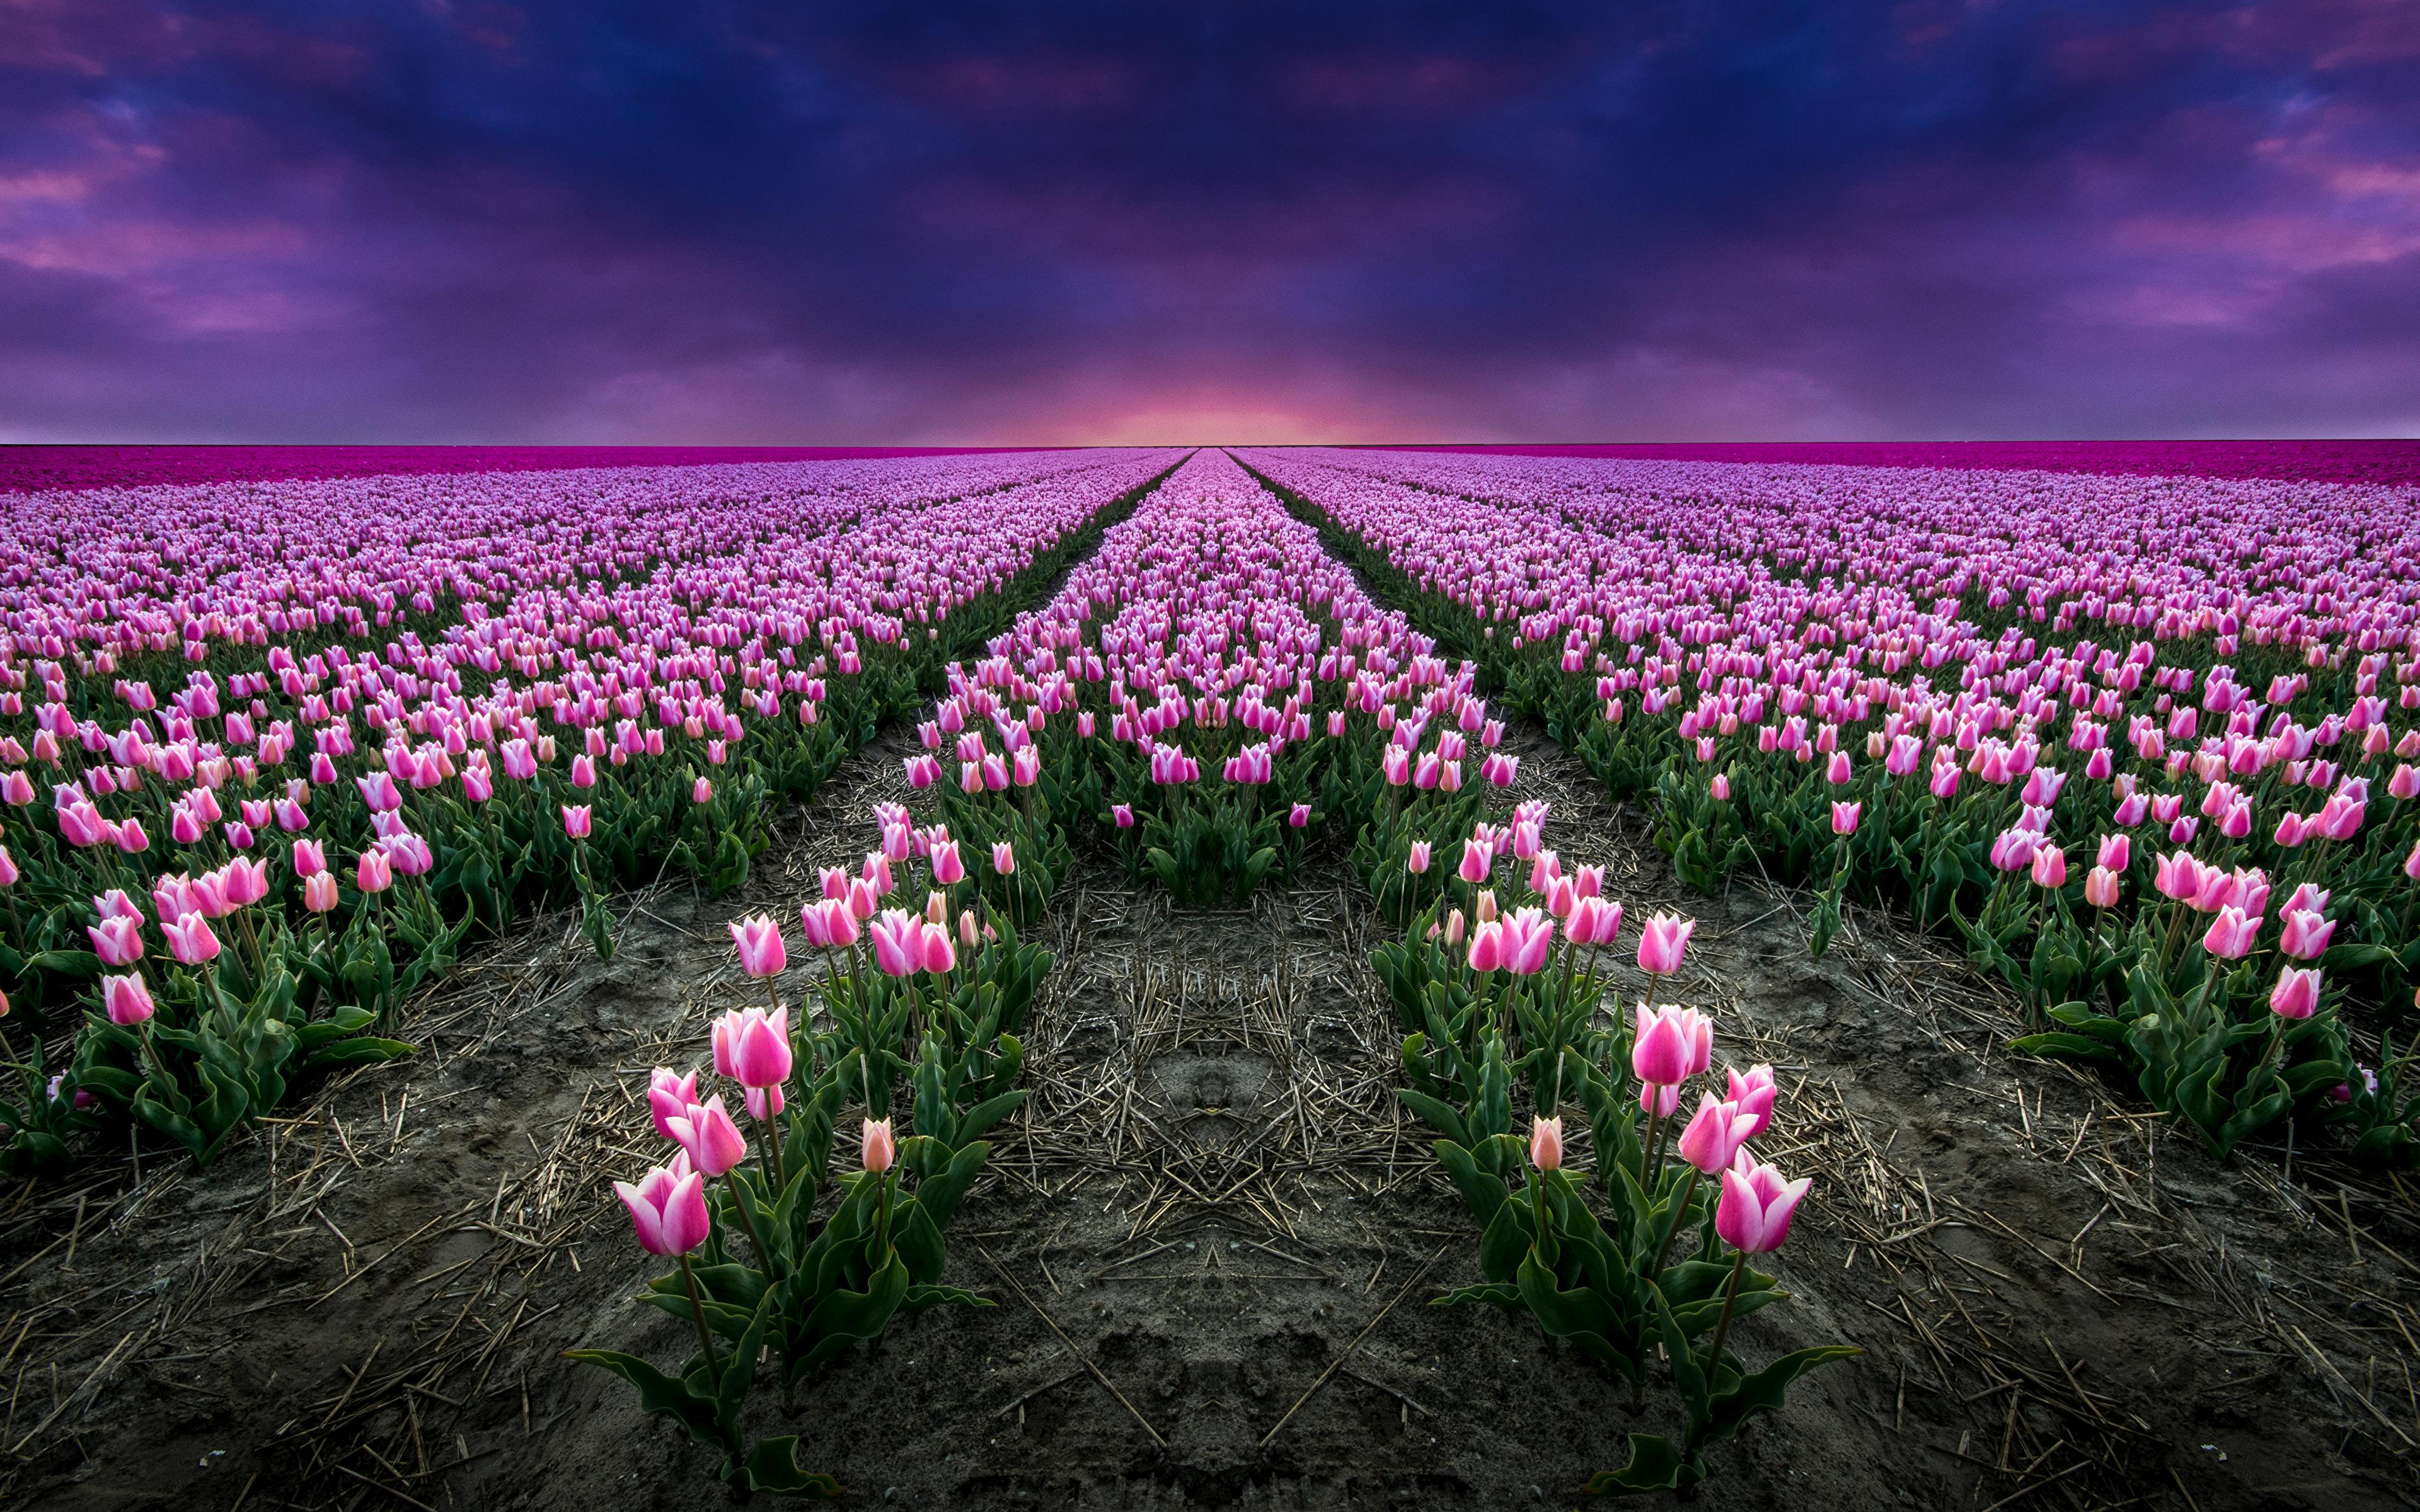 тюльпаны поляна закат  № 3285798 загрузить